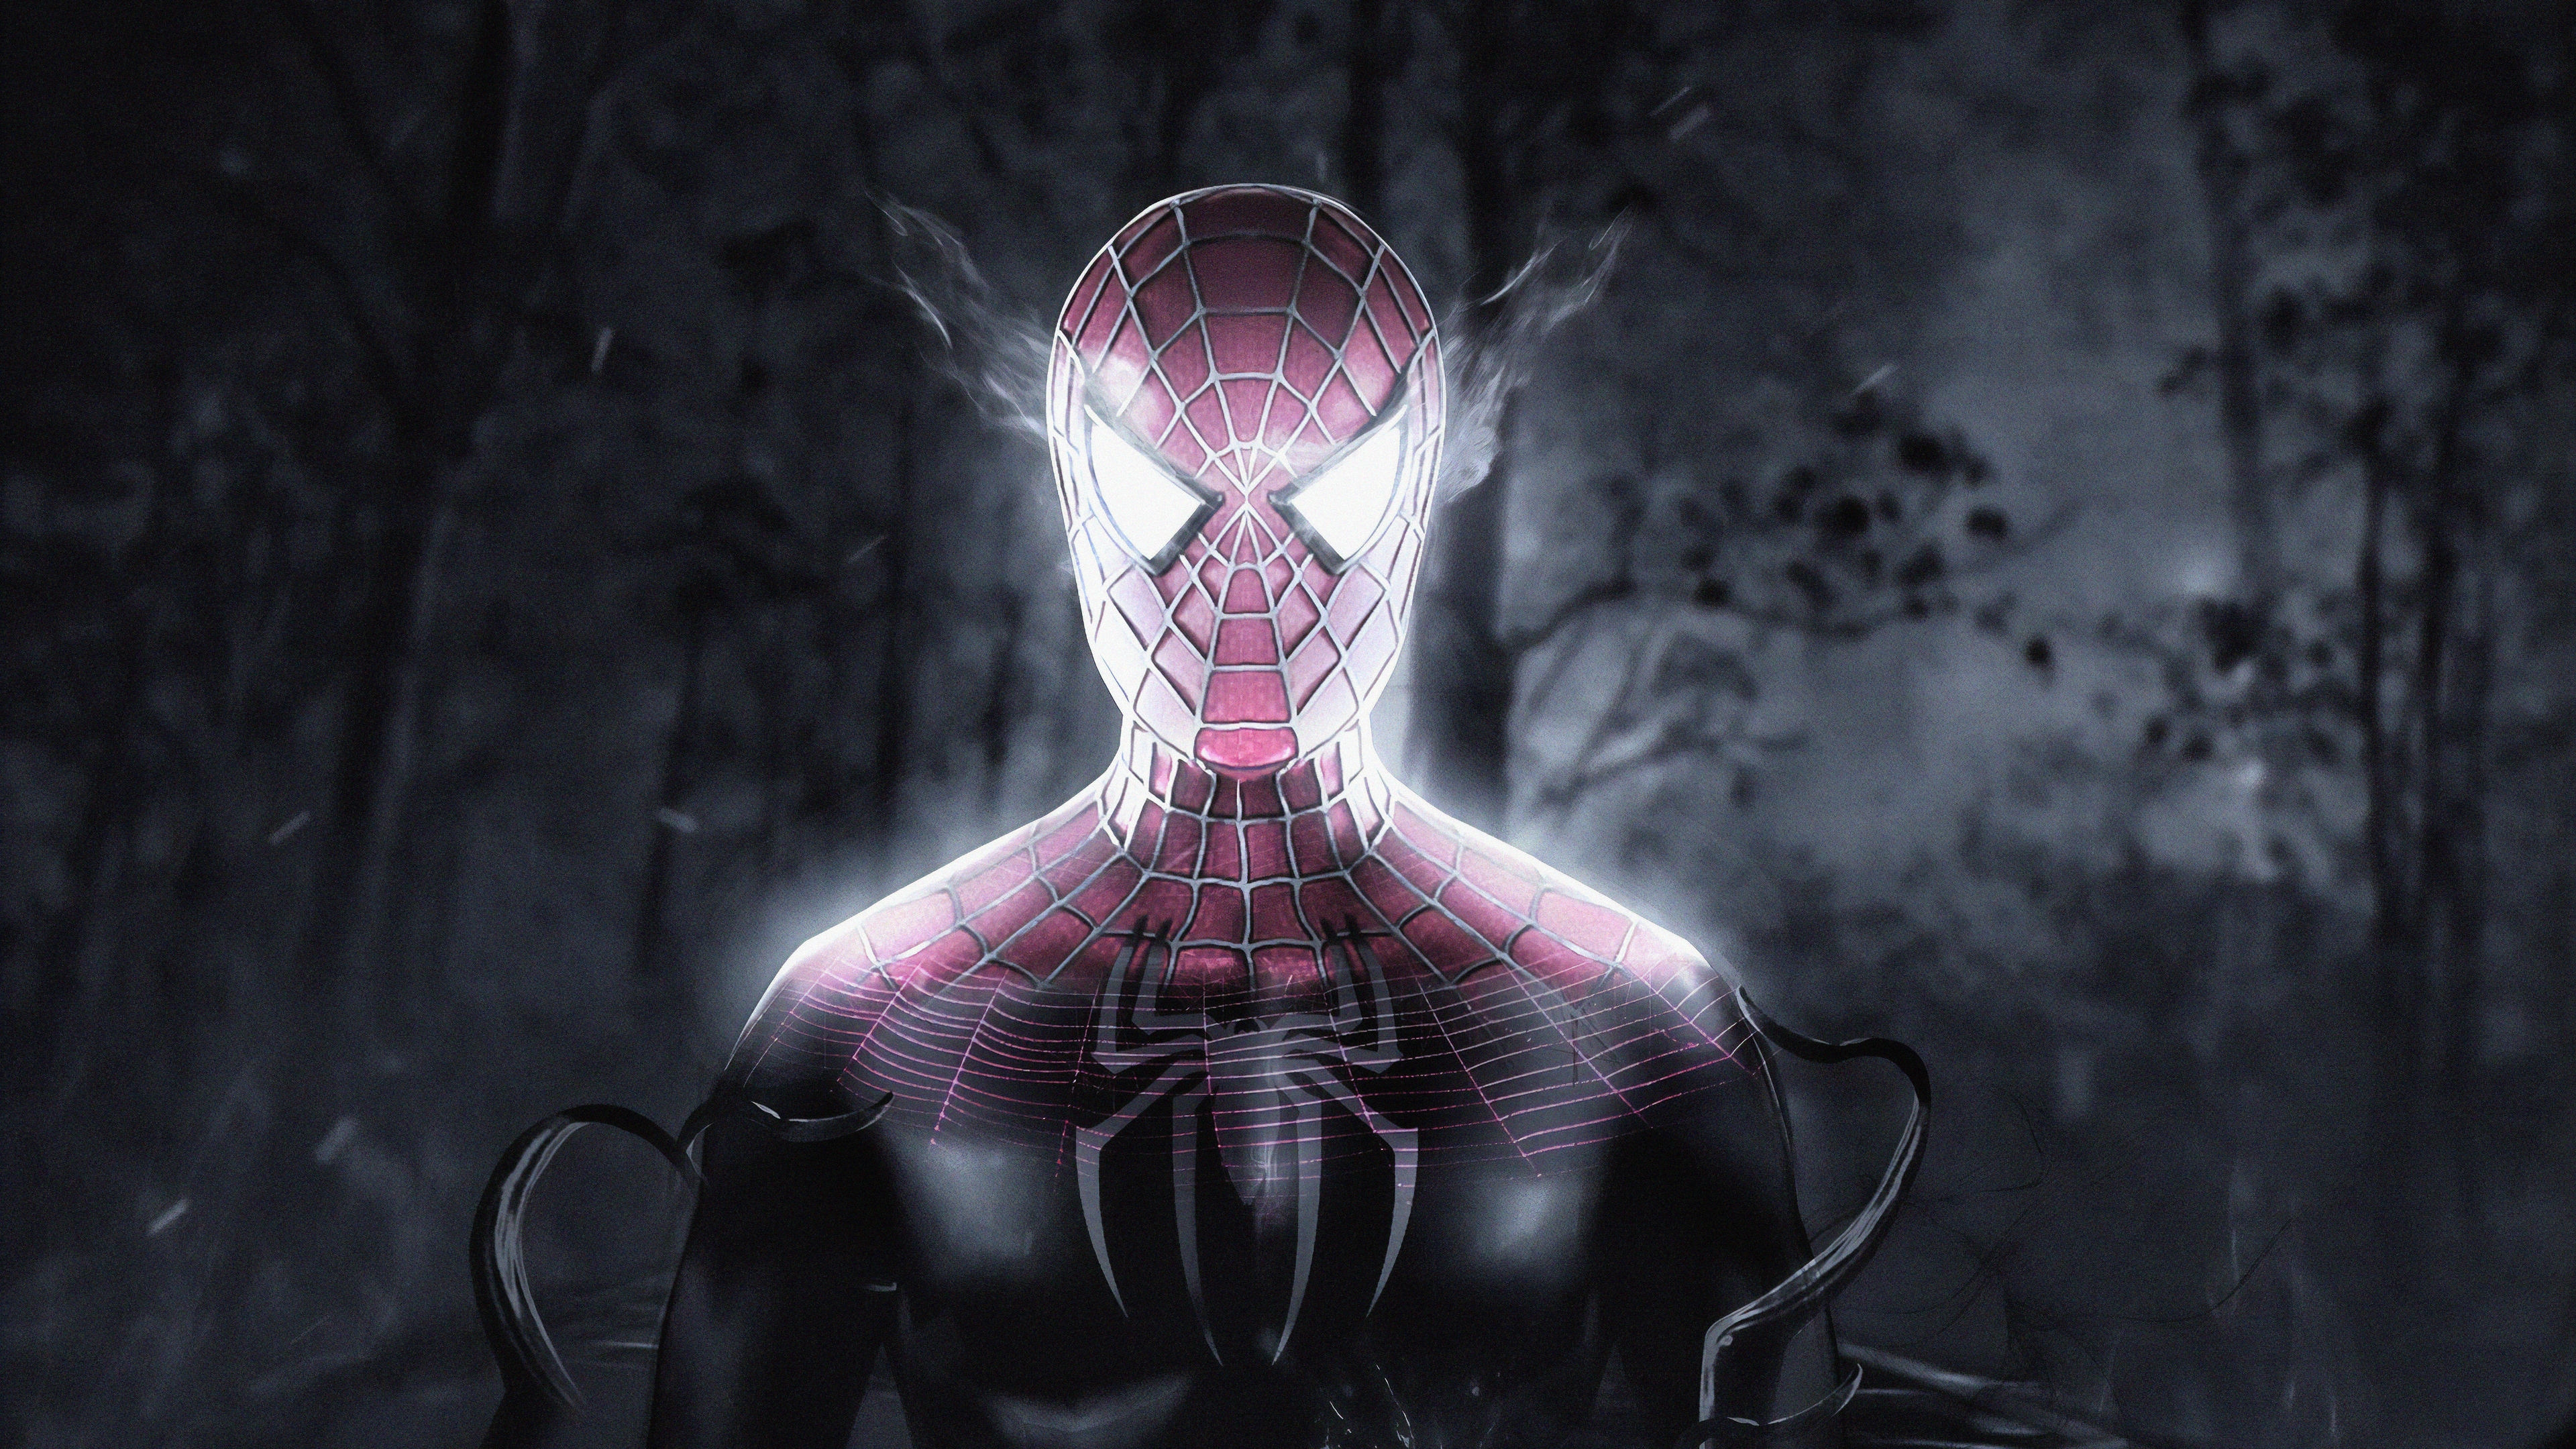 Wallpaper 4k Spiderman Inside Venom 4k Wallpapers Art